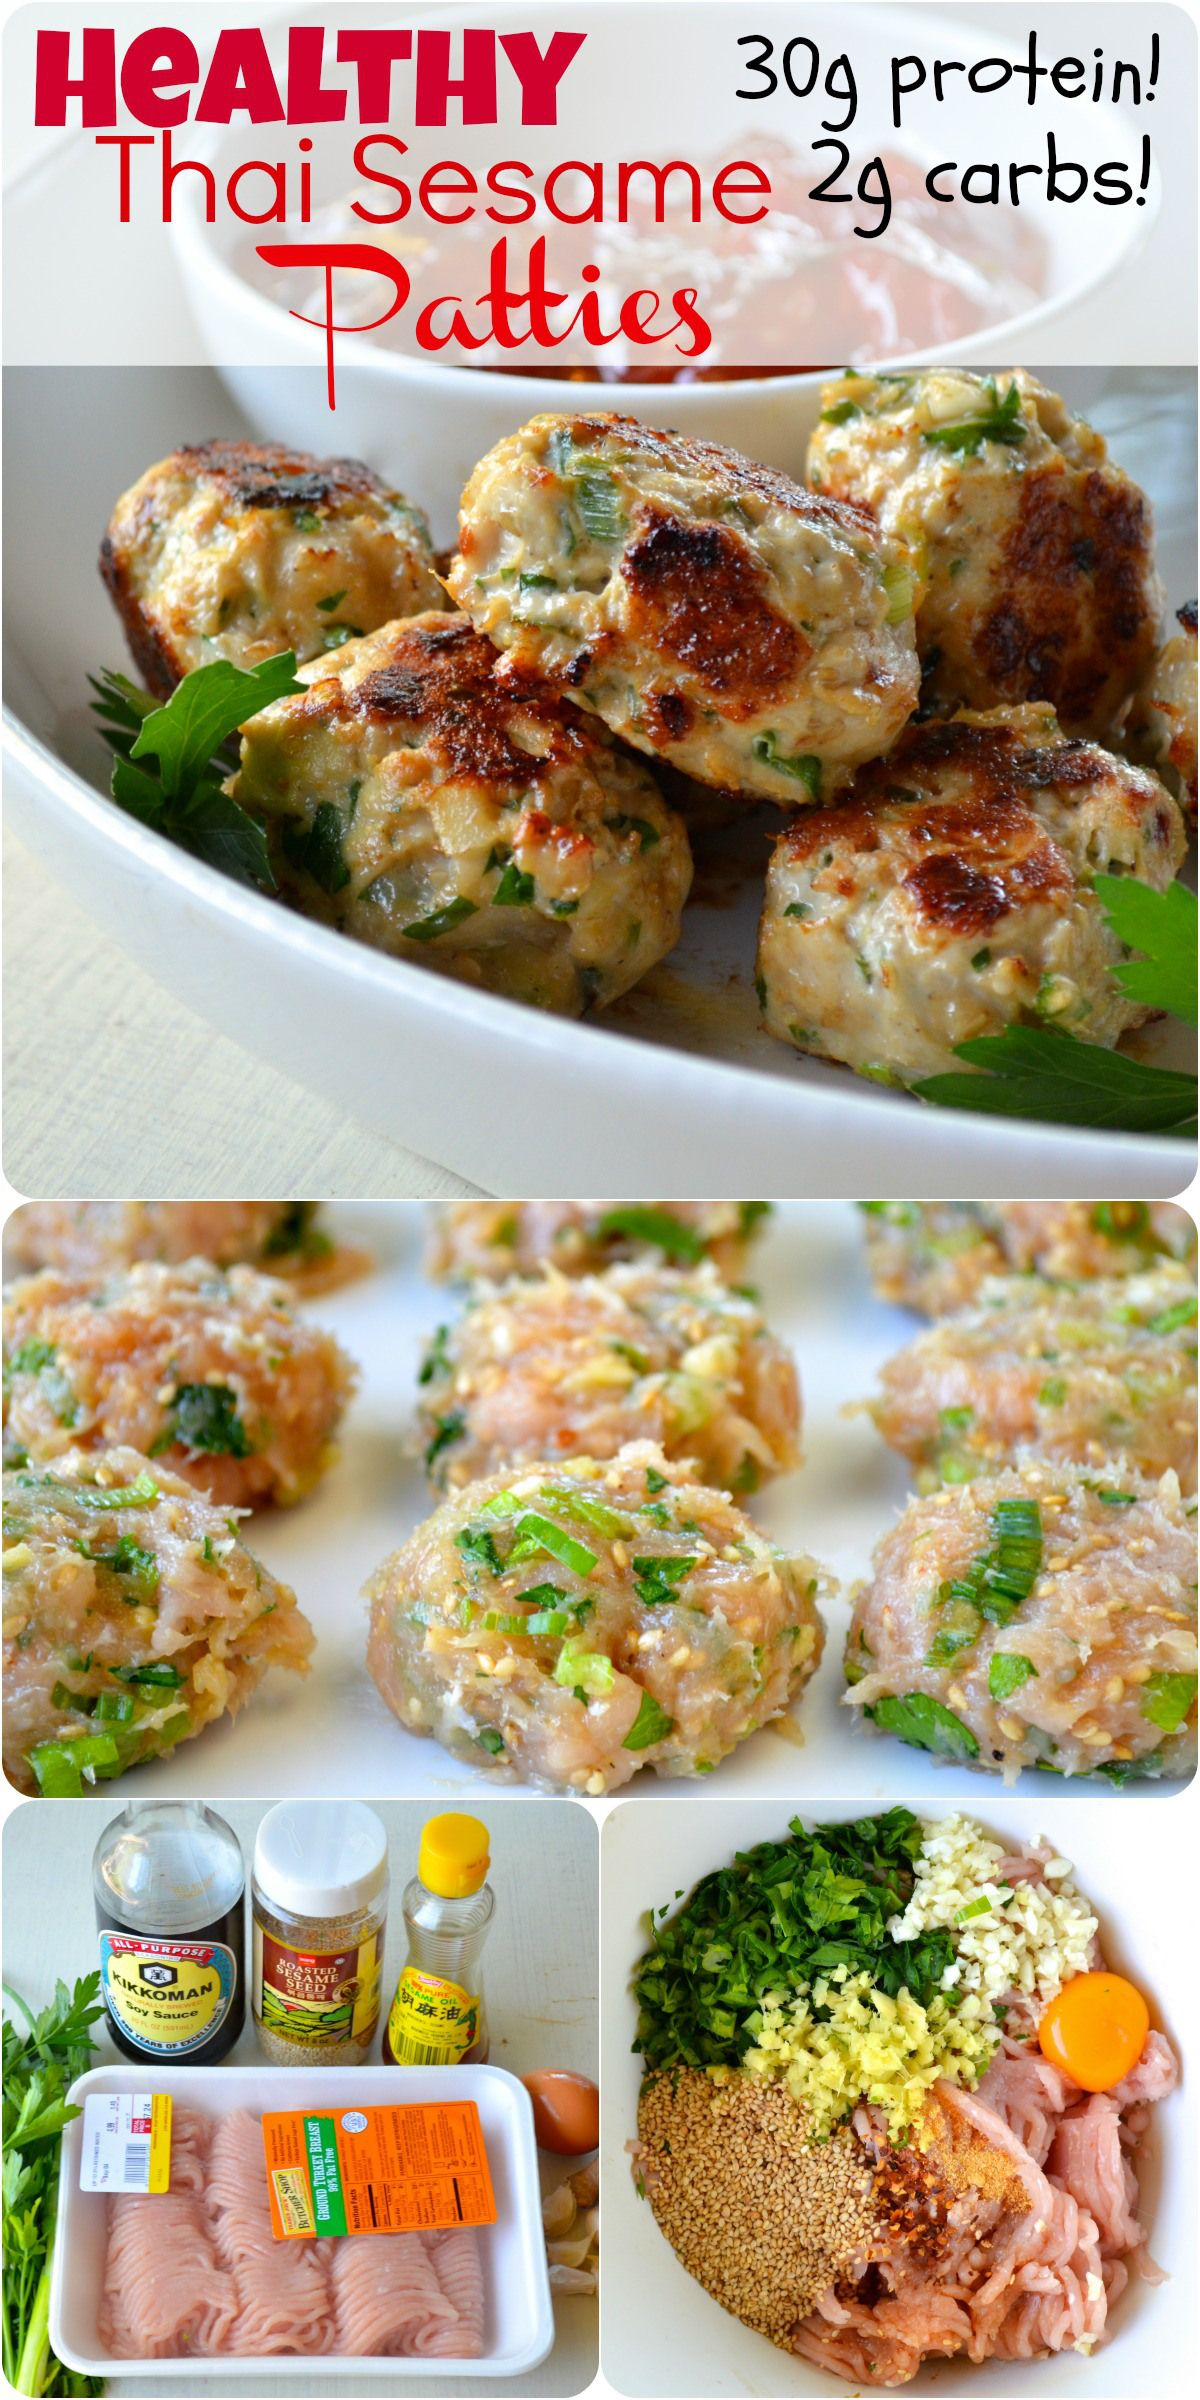 Healthy thai sesame patties recipe foods recipes and asian healthy thai sesame patties forumfinder Choice Image